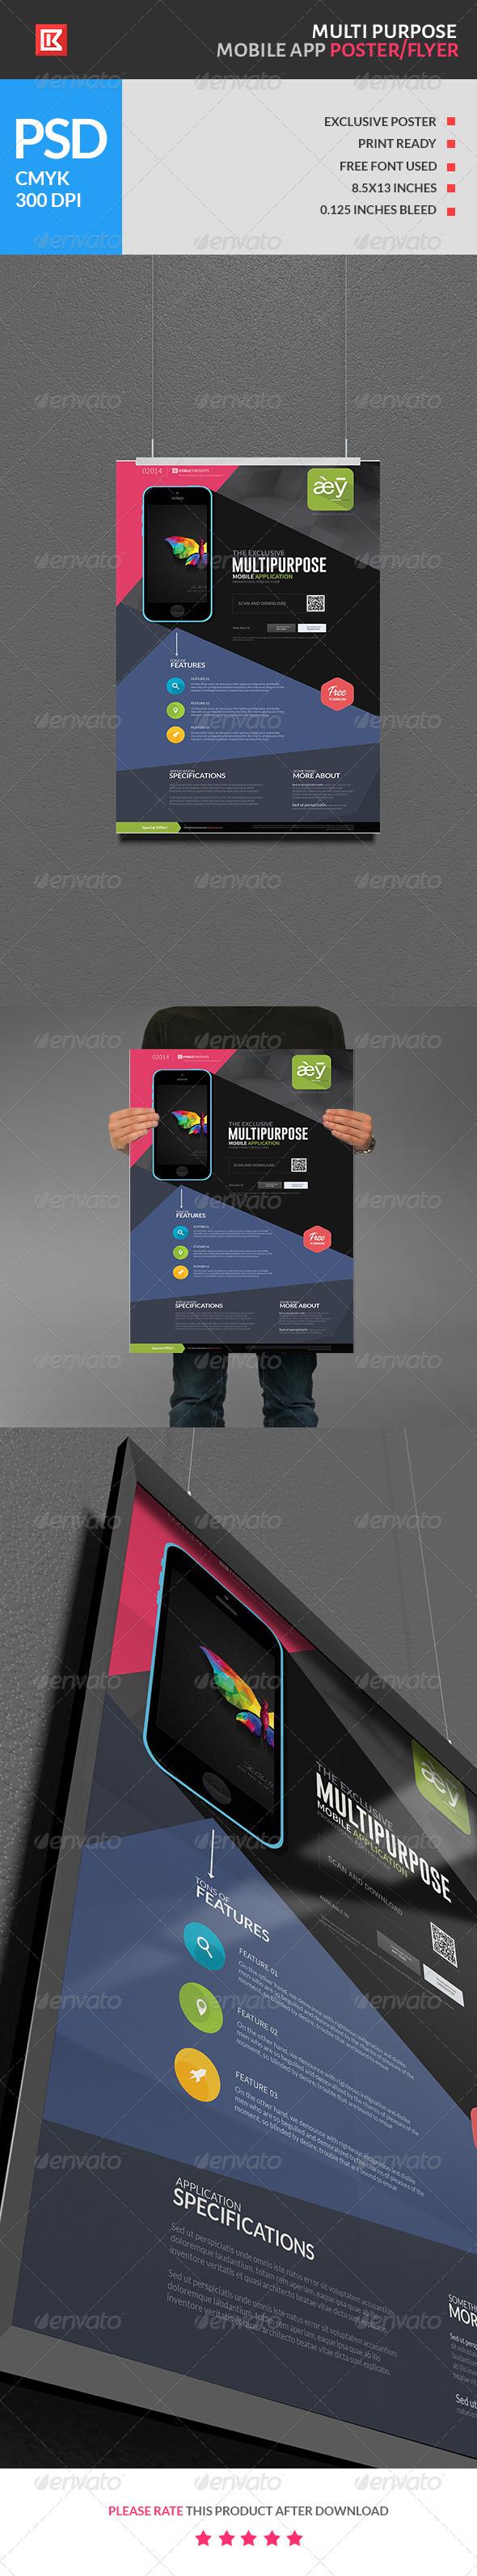 GraphicRiver Multipurpose Mobile App Poster Flyer 6848316